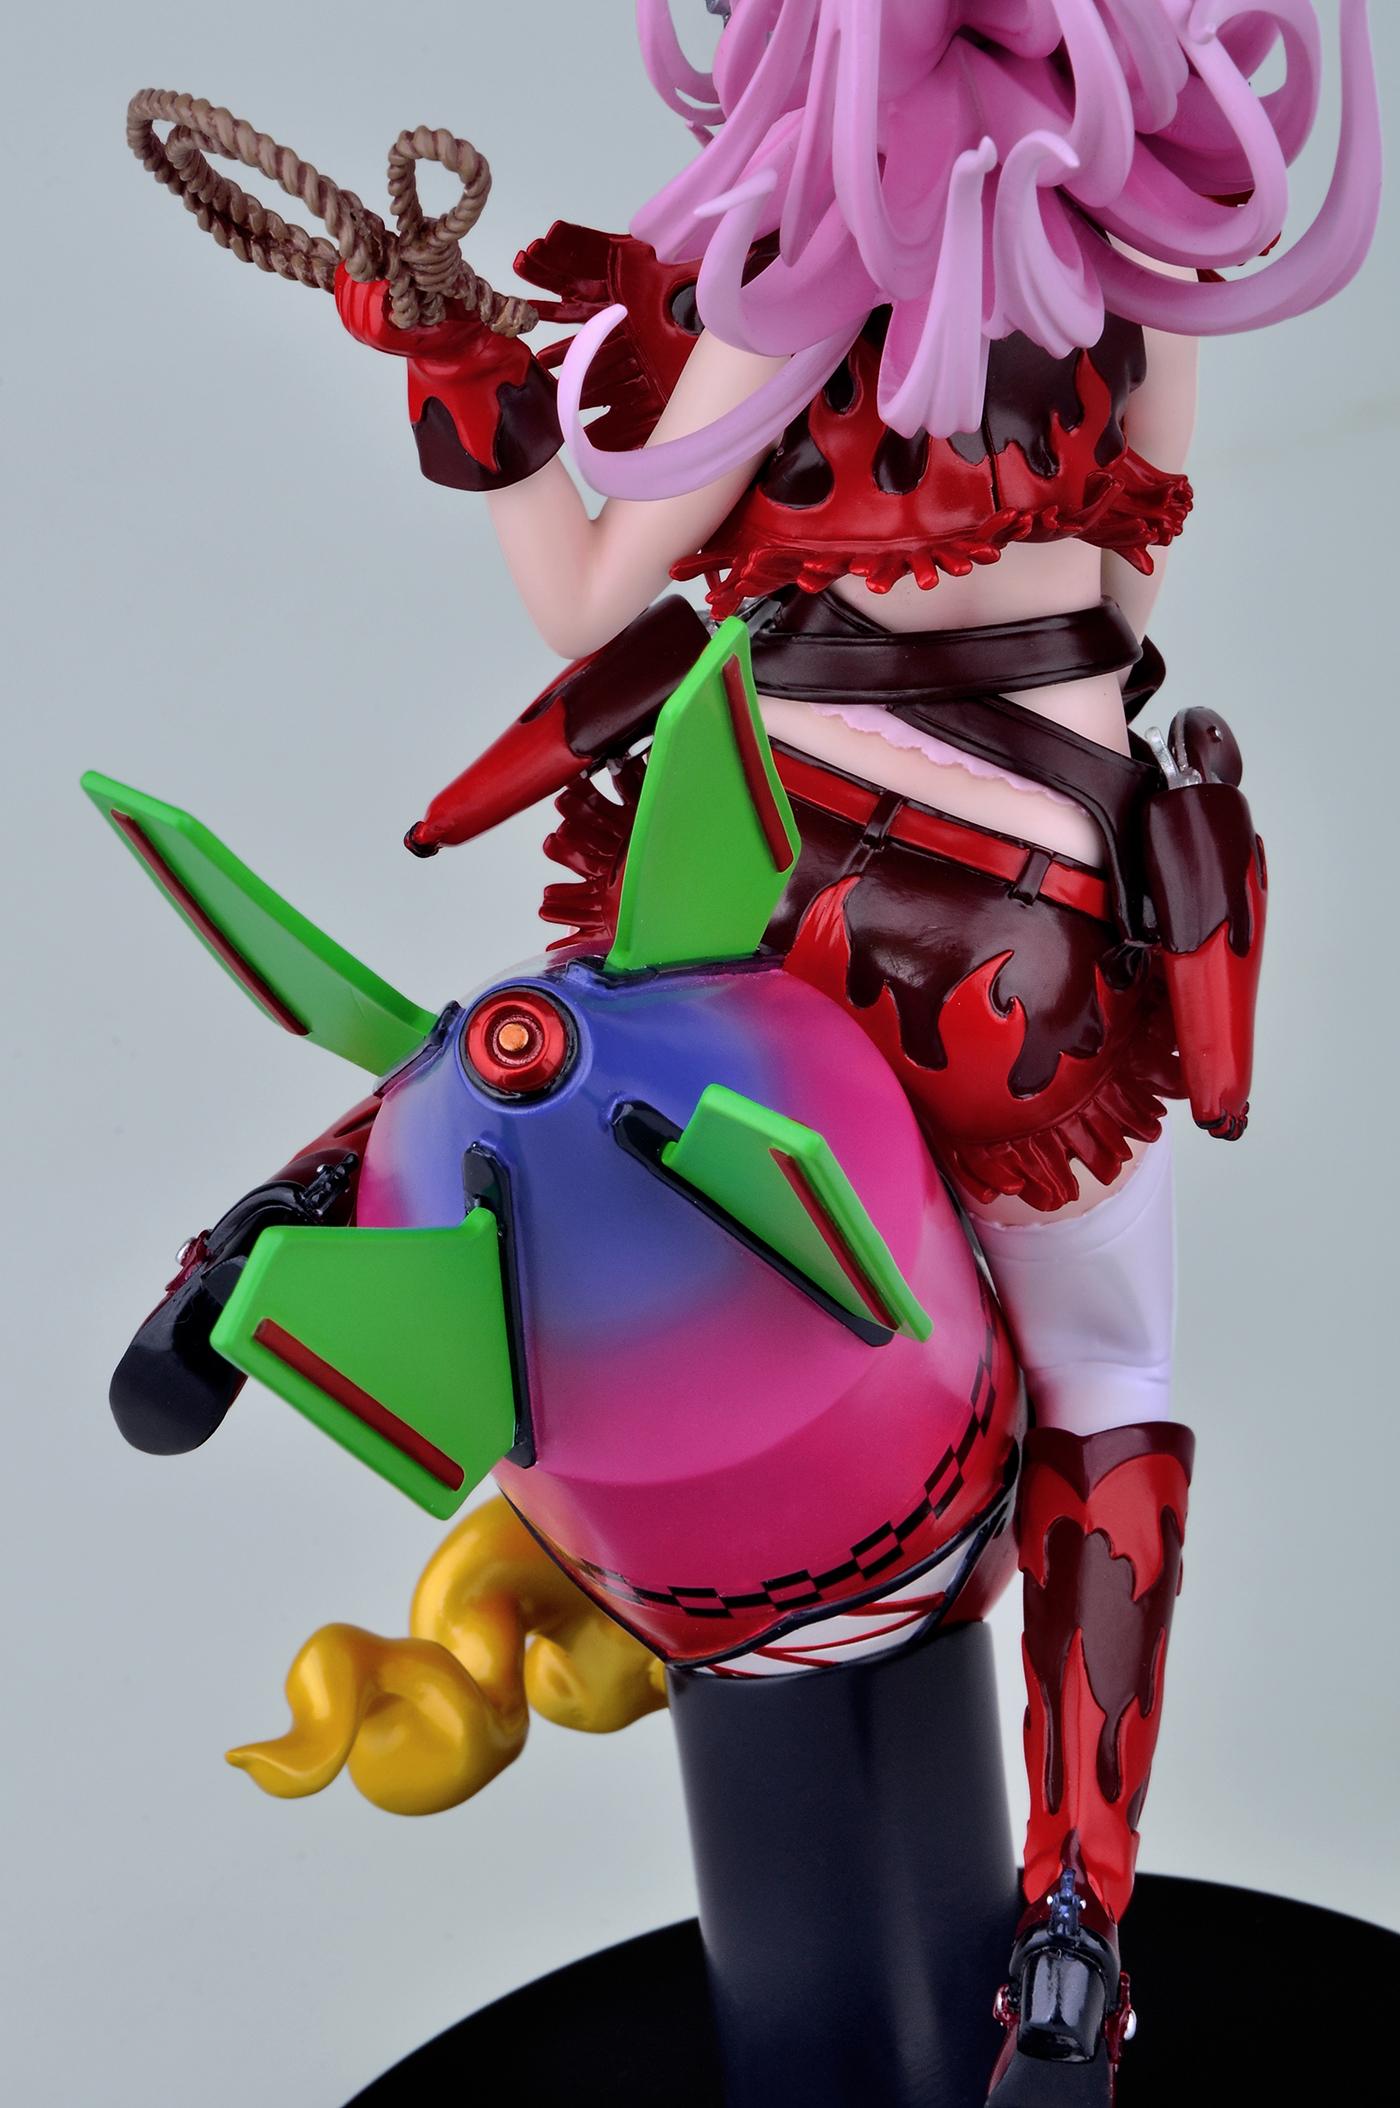 Nitroplus' Mascot Rides a Giant Rocket haruhichan.com Super Sonico rocket figure02